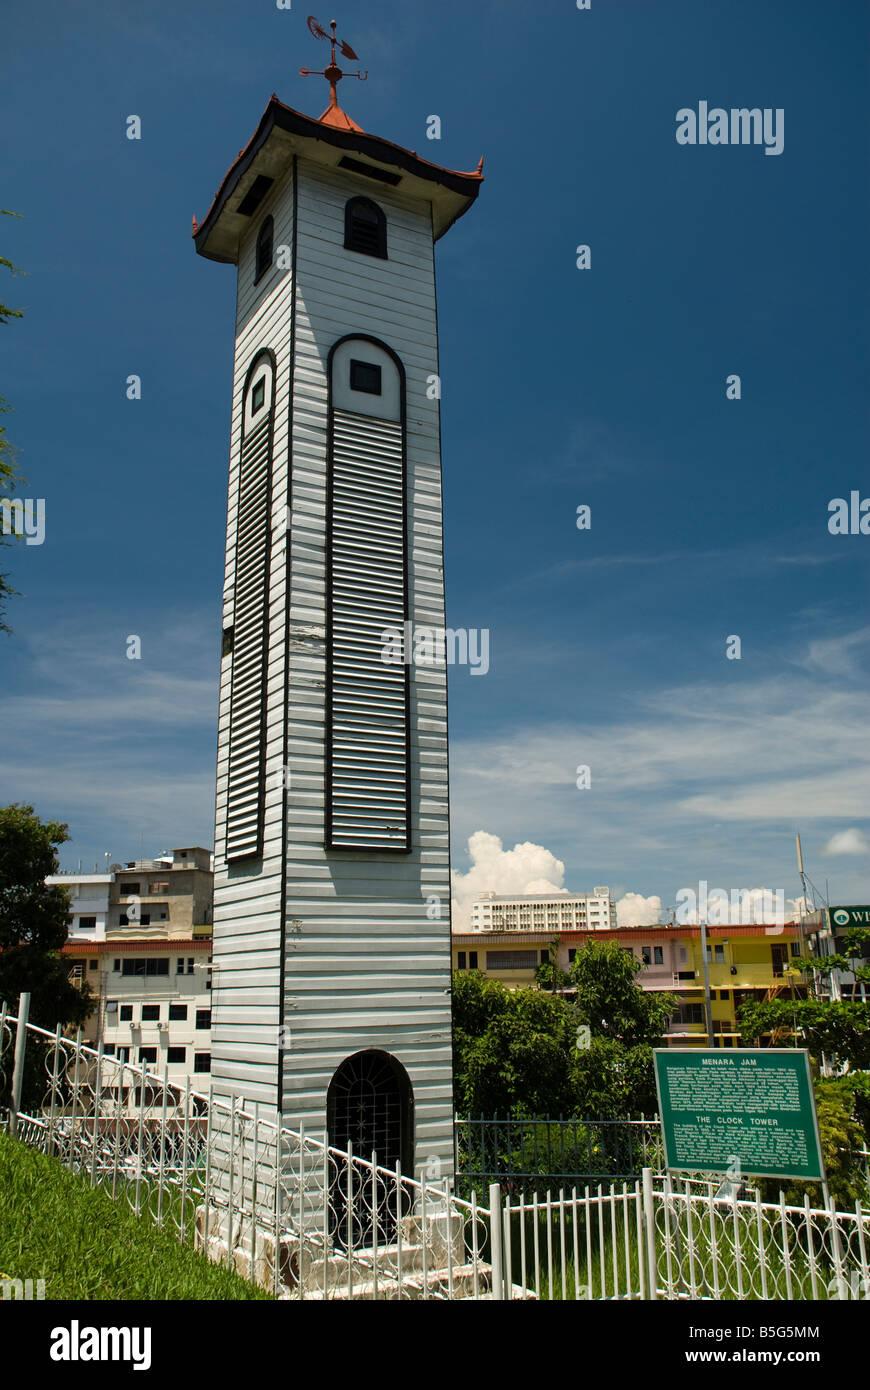 The Clock Tower Kota Kinabalu - Stock Image